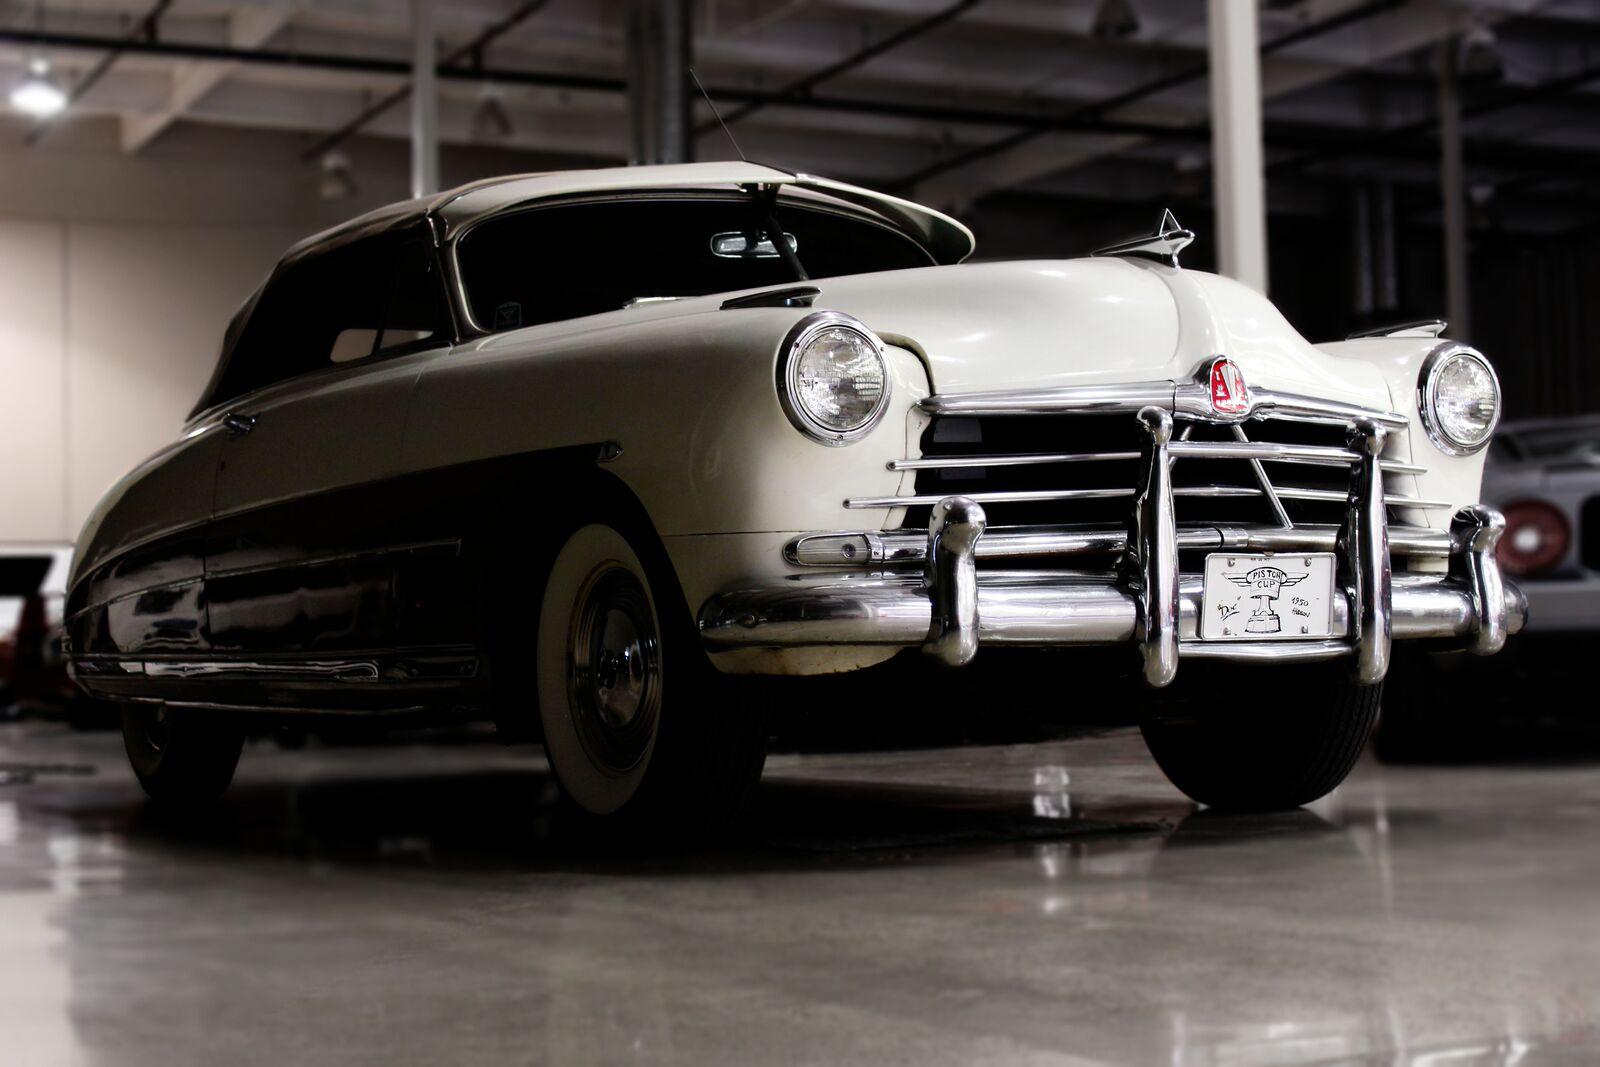 Steve McQueen's 1950 Hudson Commodore